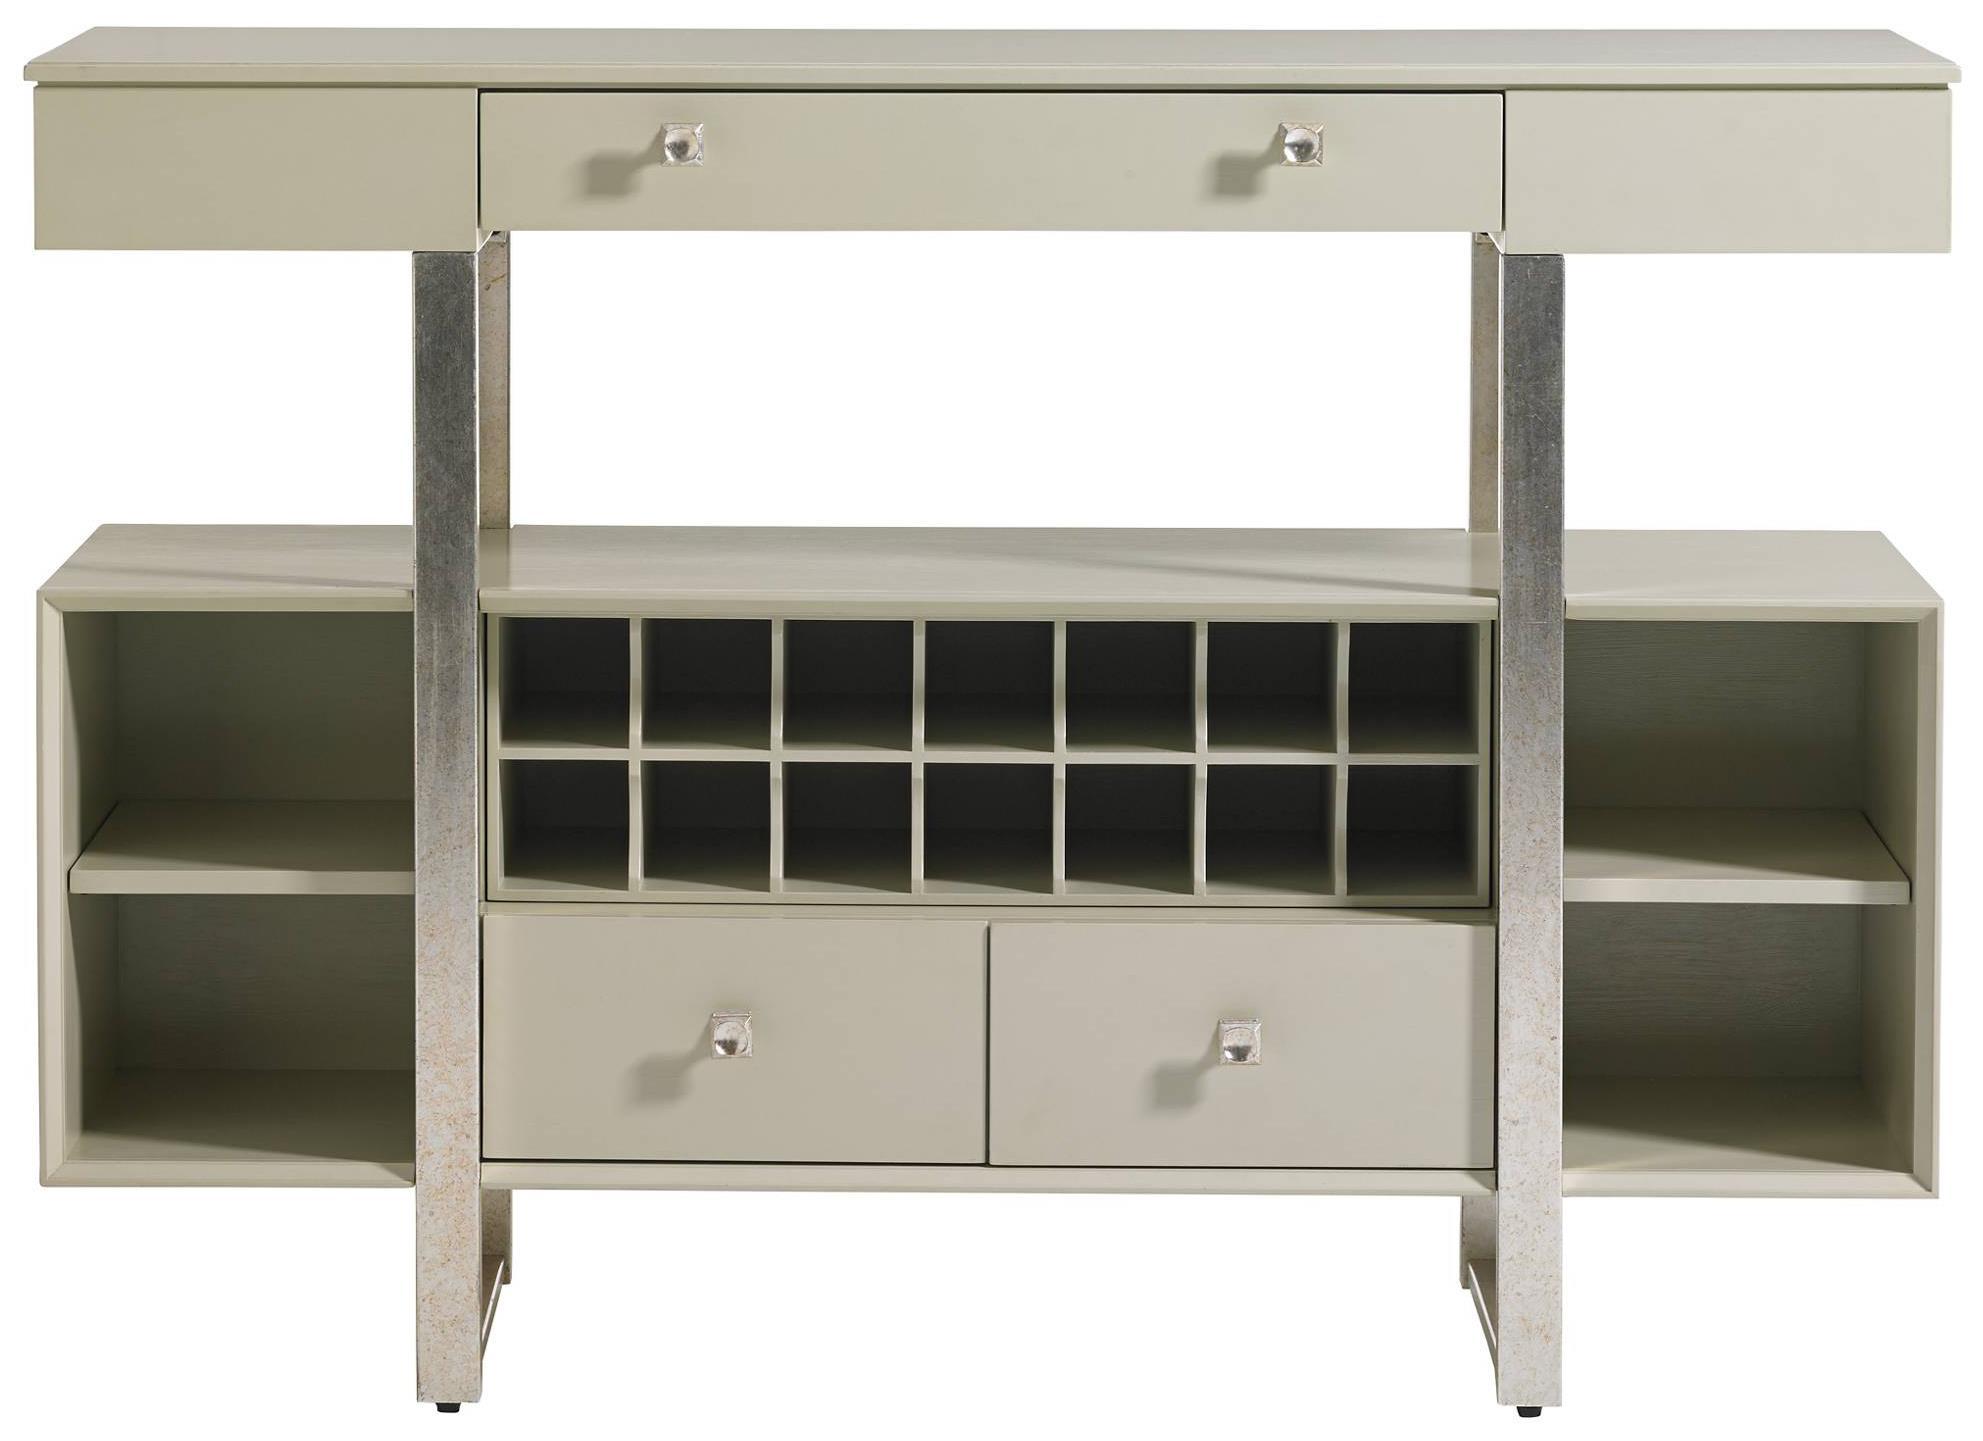 Stanley Furniture Crestaire Crosley Sideboard - Item Number: 436-21-06